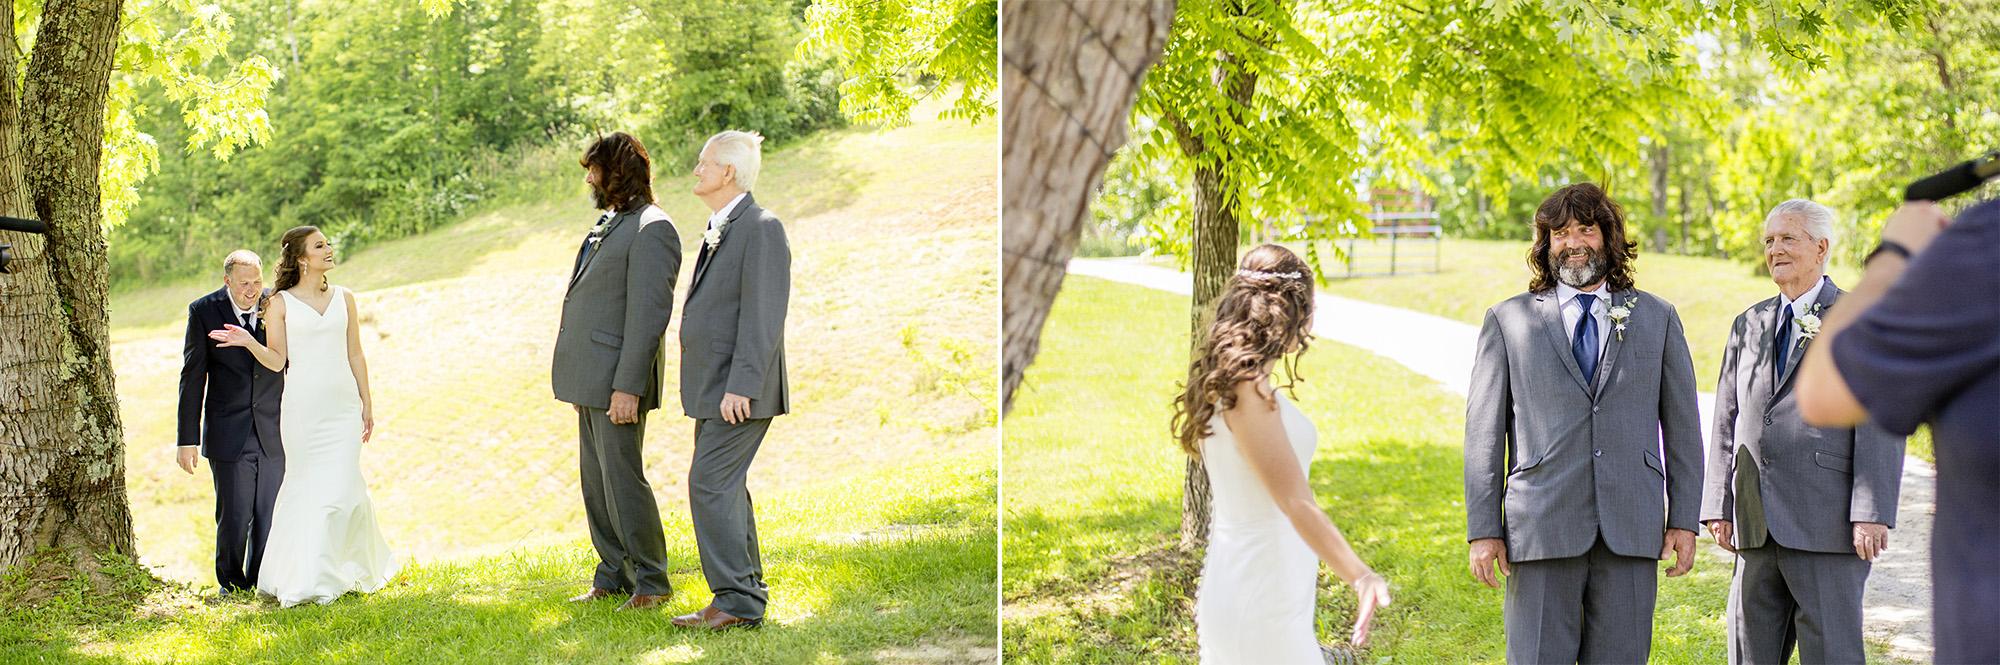 Seriously_Sabrina_Photography_Red_River_Gorge_Wedding_Barn_Robinson35.jpg